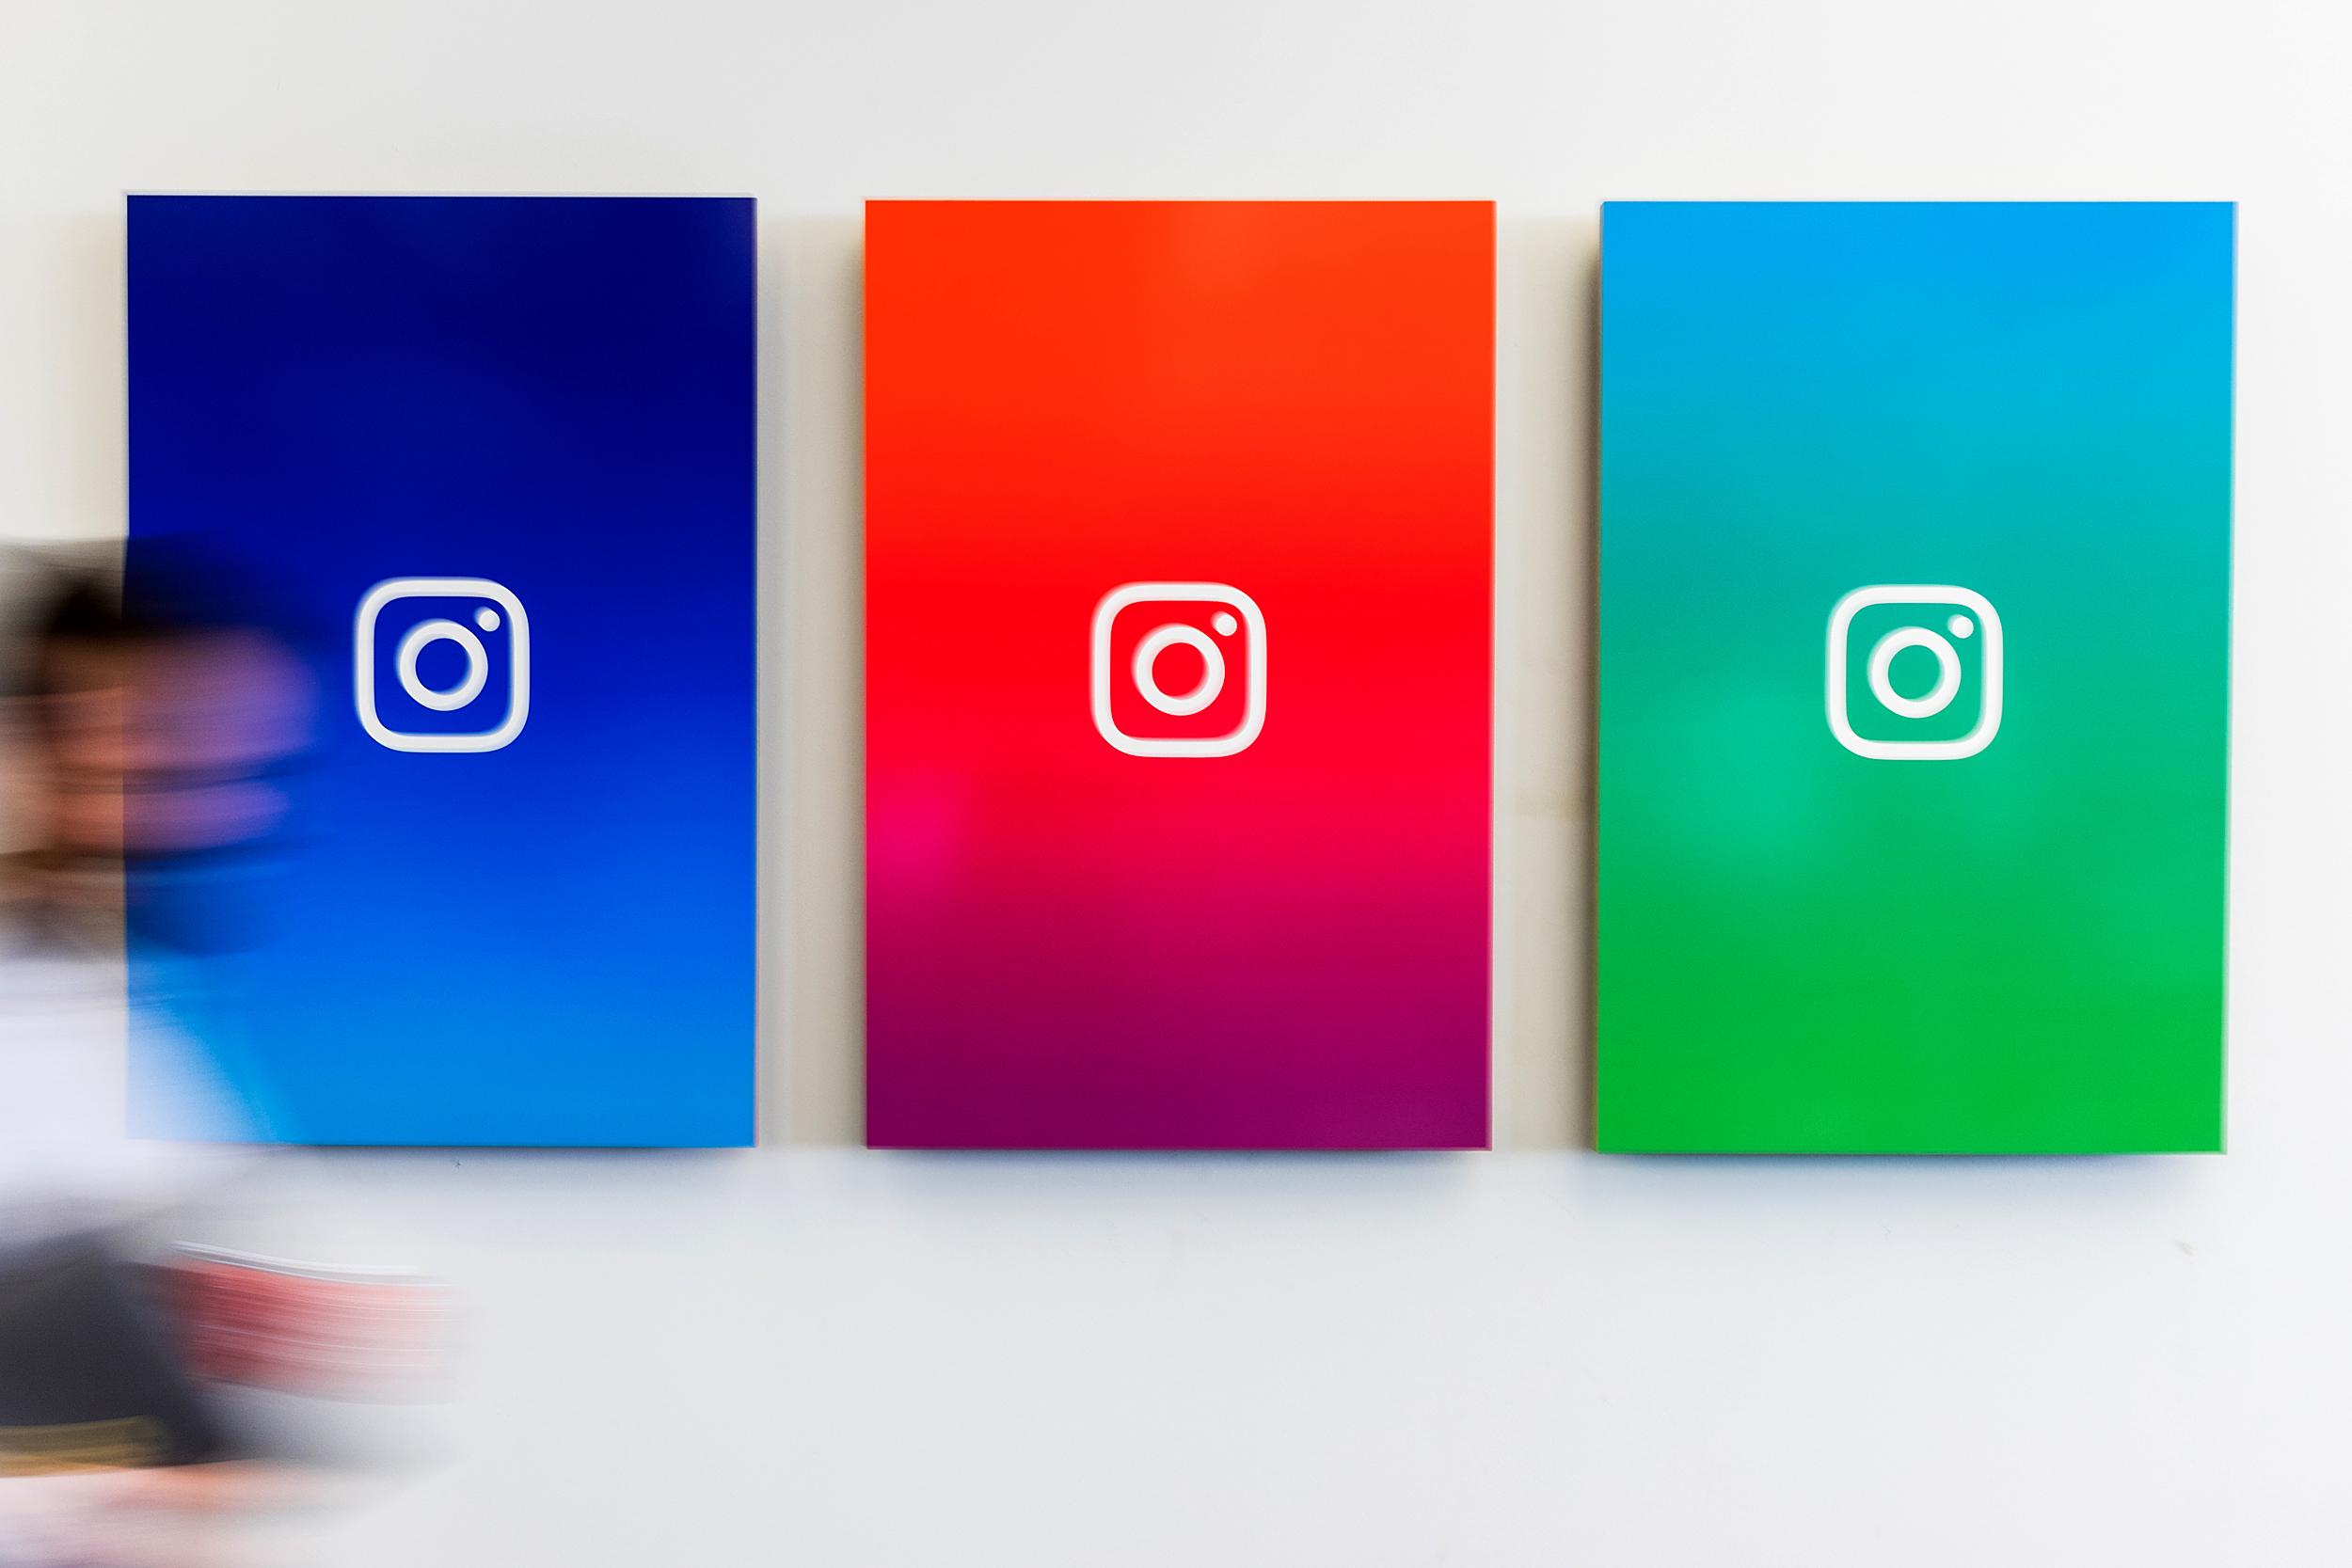 Will Instagram's new 'sensitive content' filter censor Black users?